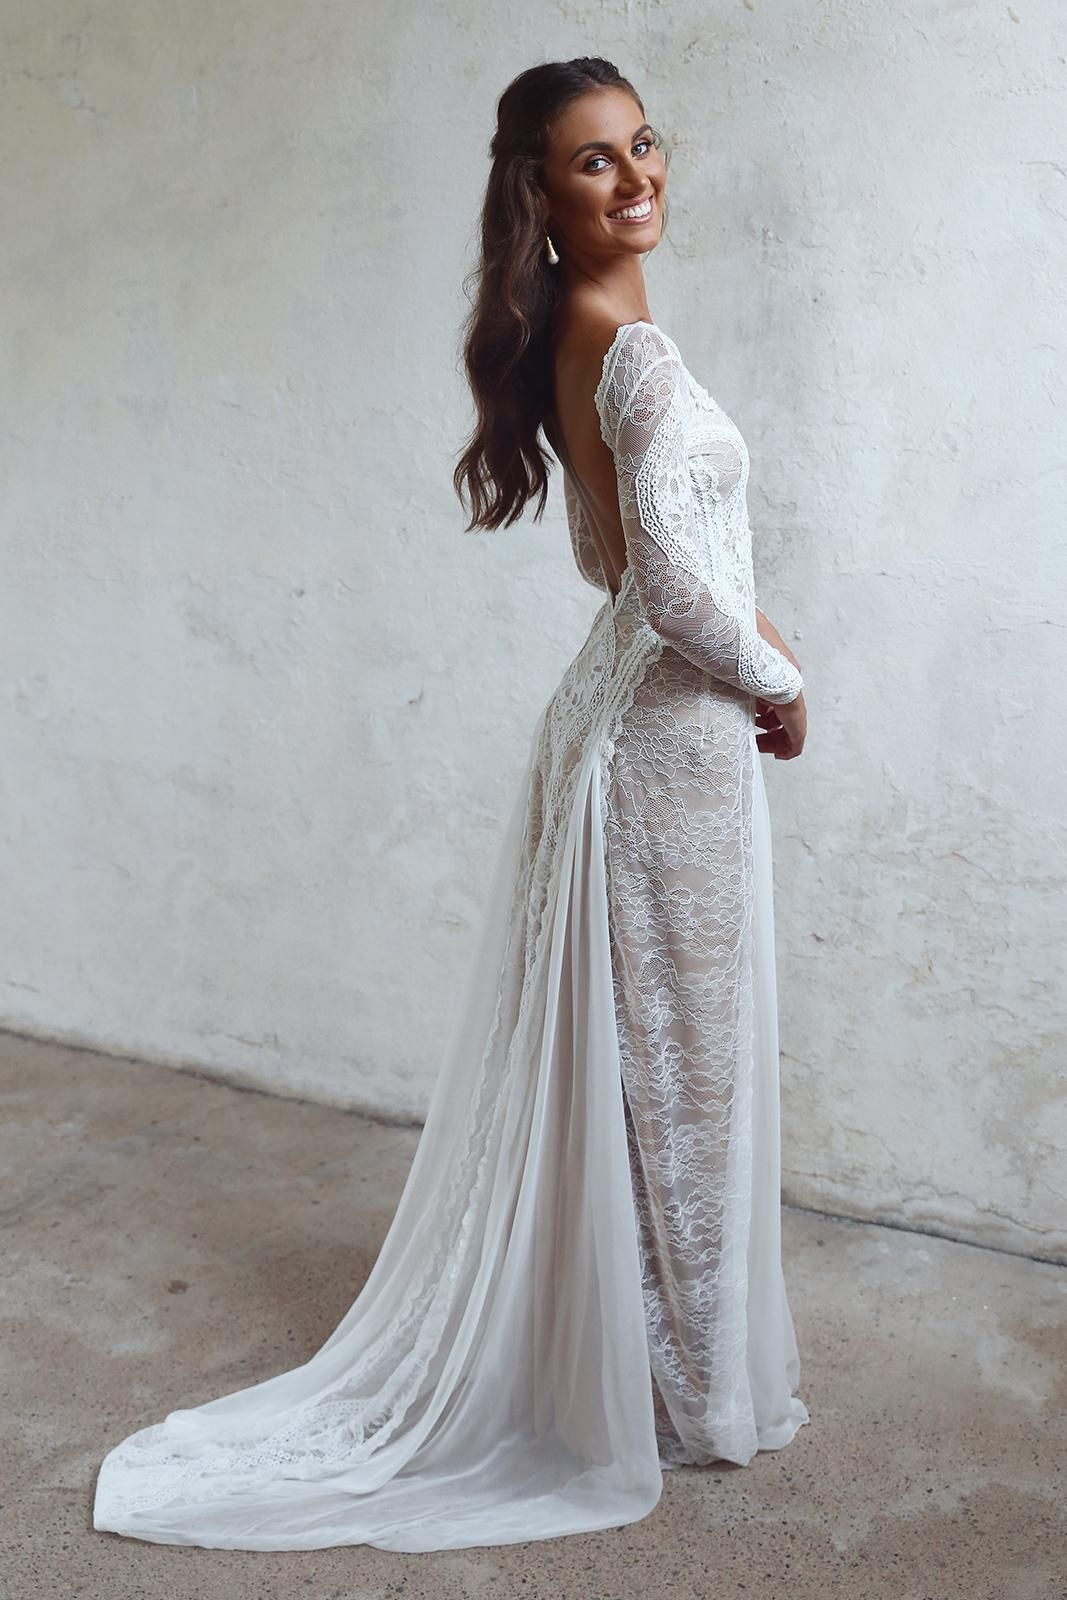 Inca Gown Low Back Wedding Dress Grace Loves Lace Bridal Dresses Lace Lace Applique Wedding Dress Wedding Dresses Lace